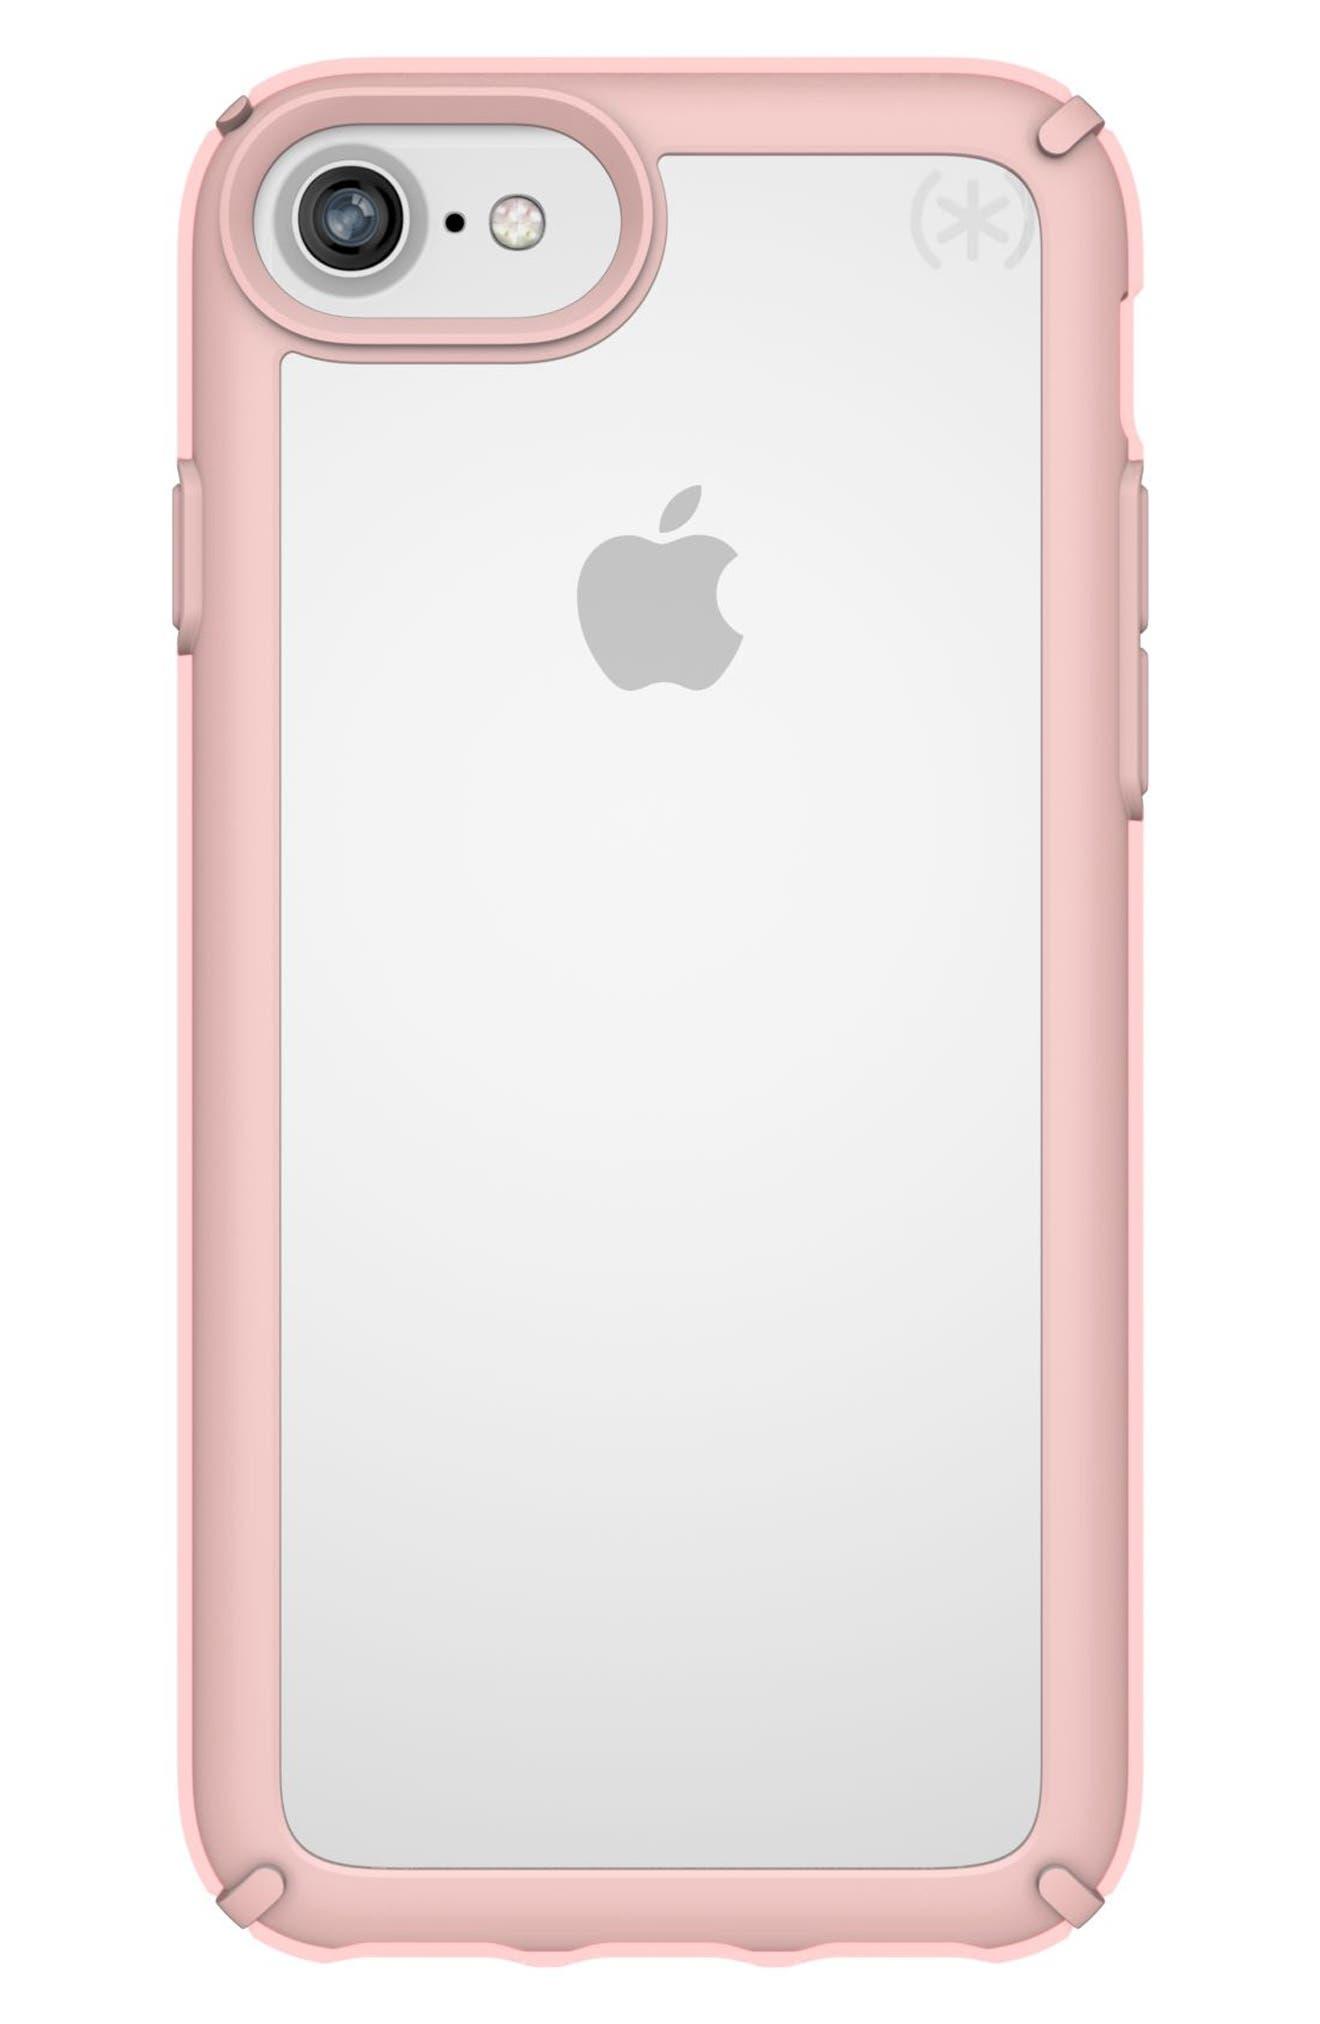 Main Image - Speck Transparent iPhone 6/6s/7/8 Case